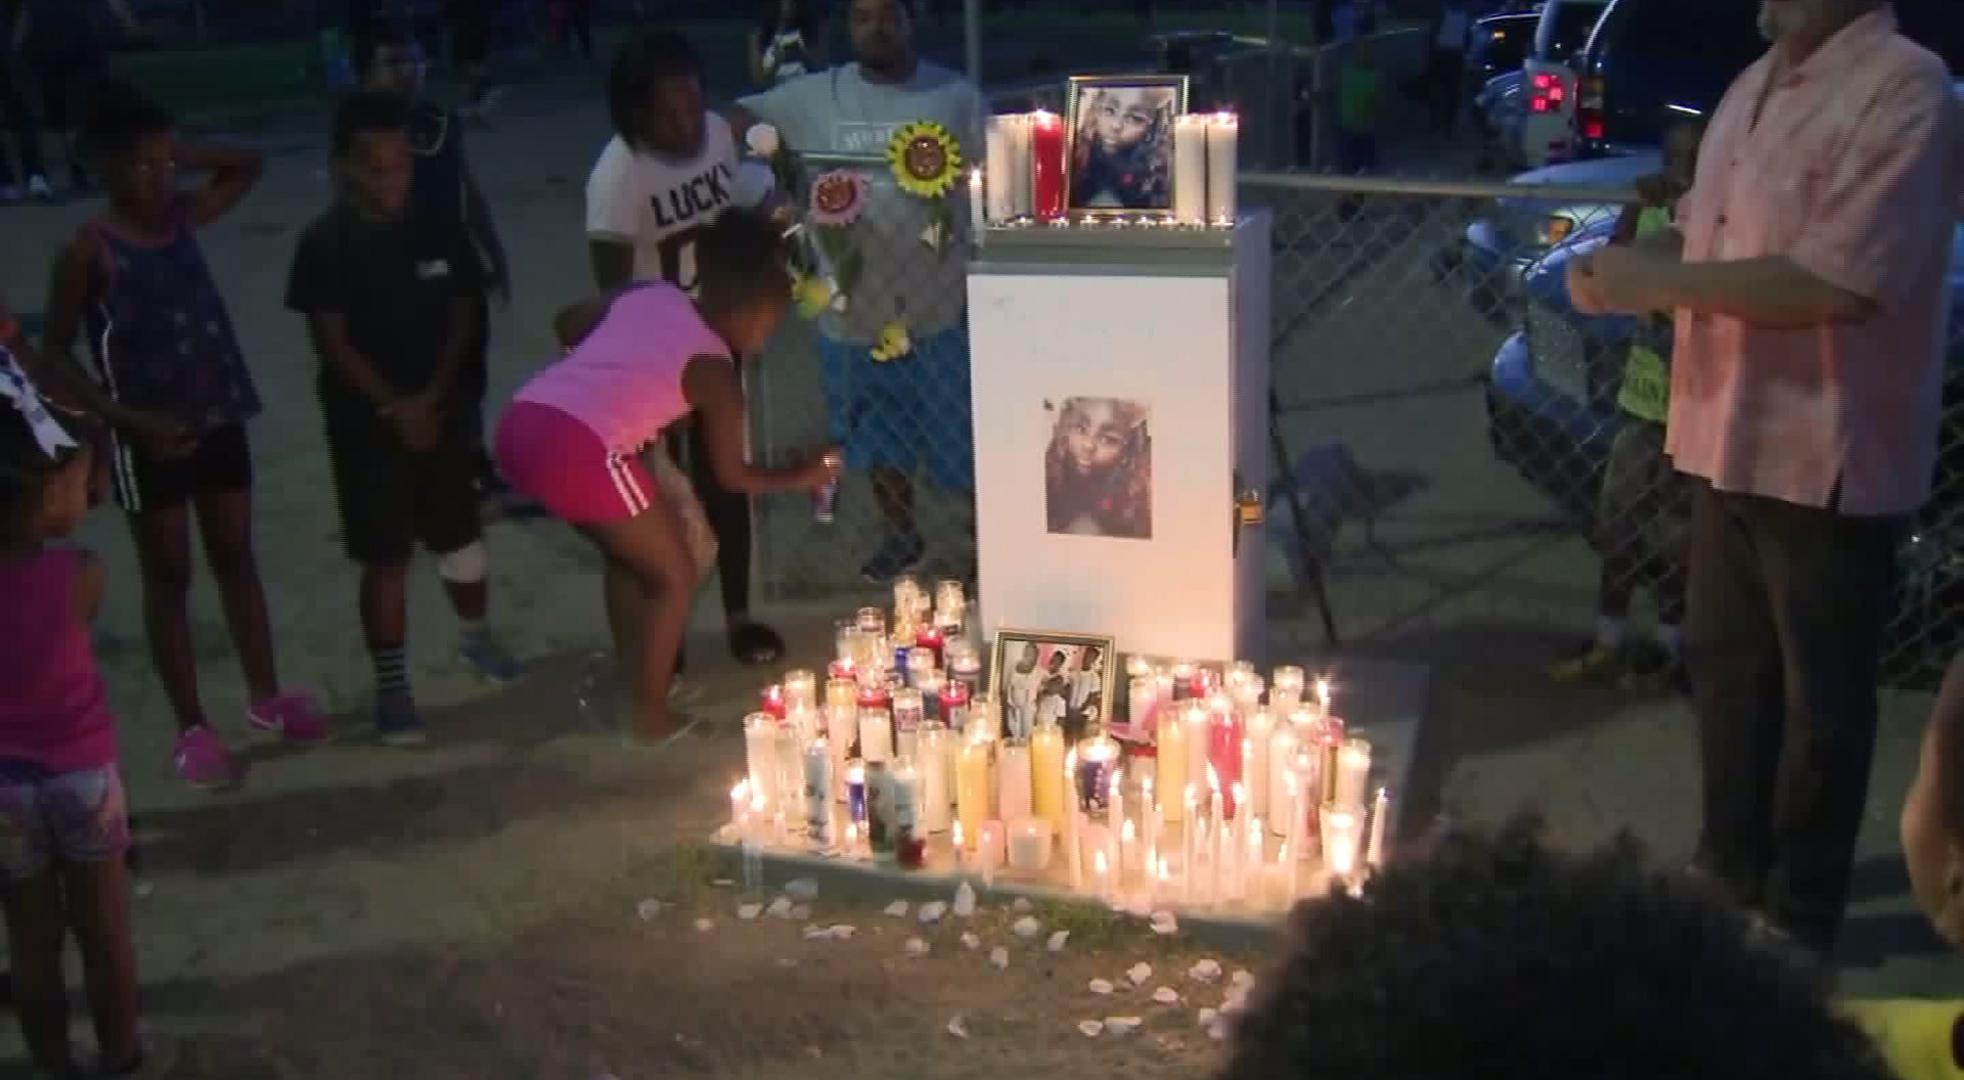 Candles surround a photo of Makiya Walls at a vigil in her honor on Aug. 10, 2017. (Credit: KTLA)